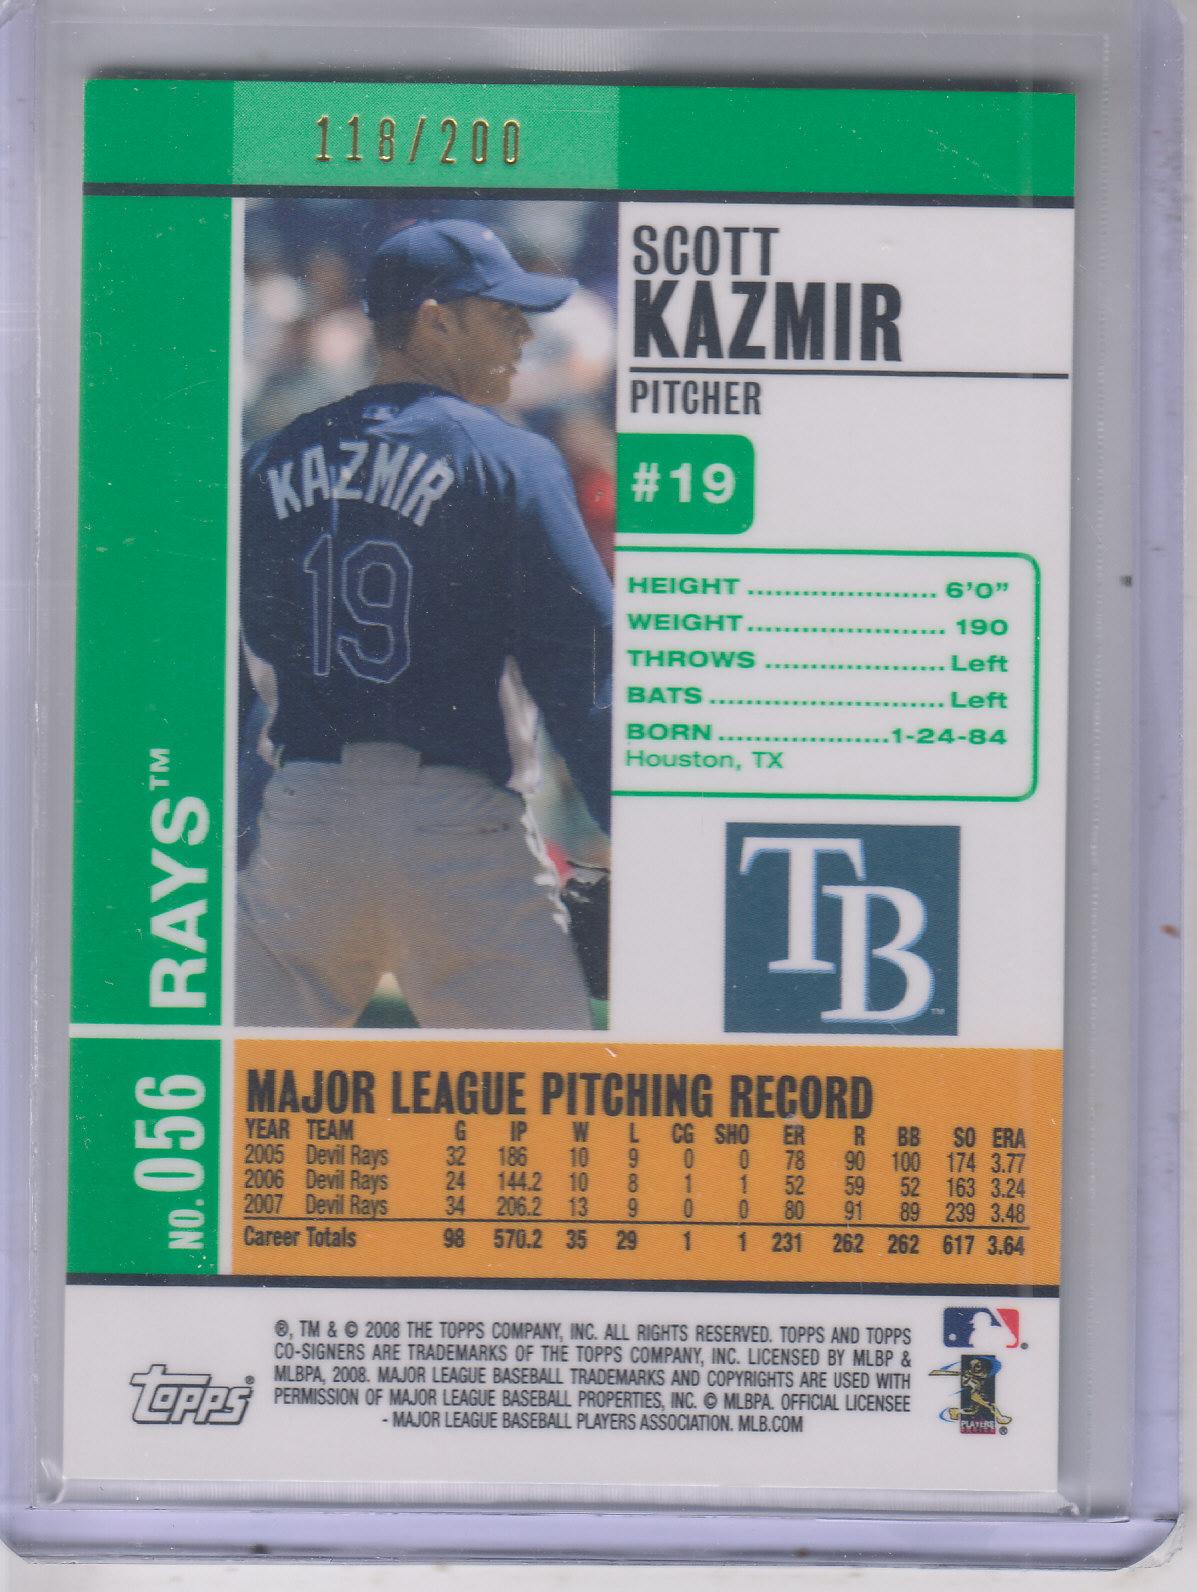 2008 Topps Co-Signers Silver Green #56b Scott Kazmir/Matt Garza back image